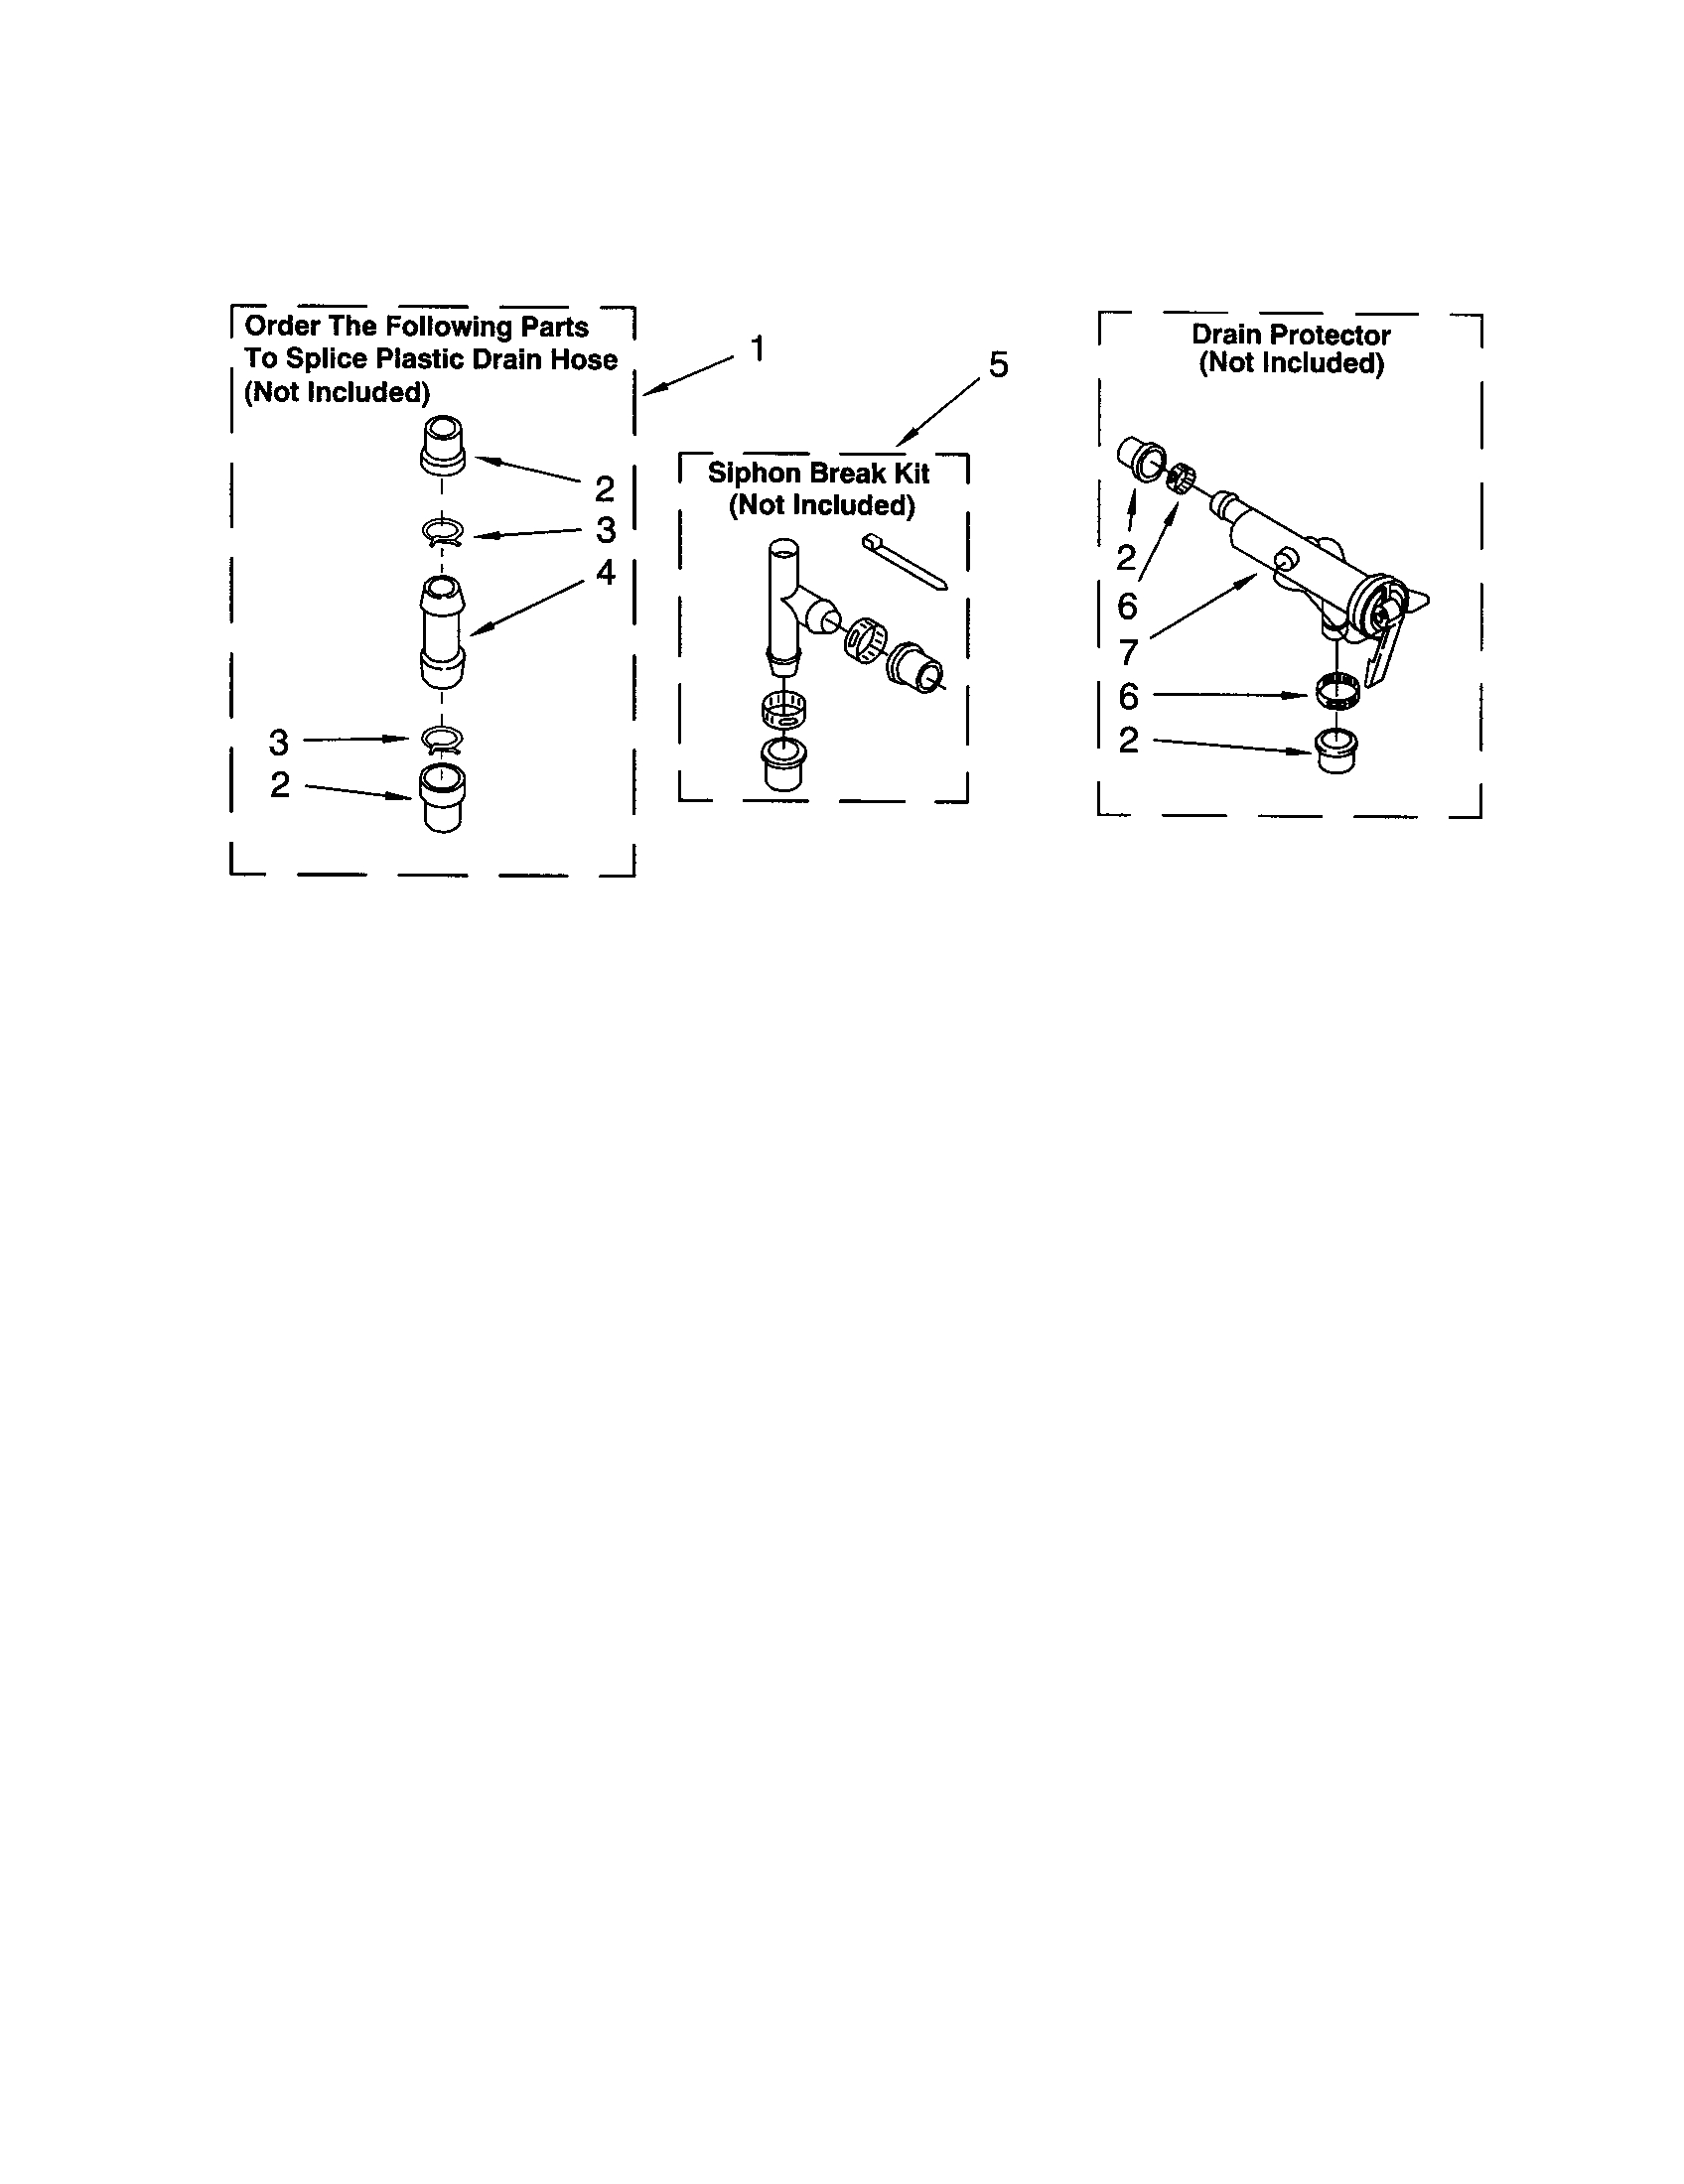 kitchenaid kaws850le0 water system diagram